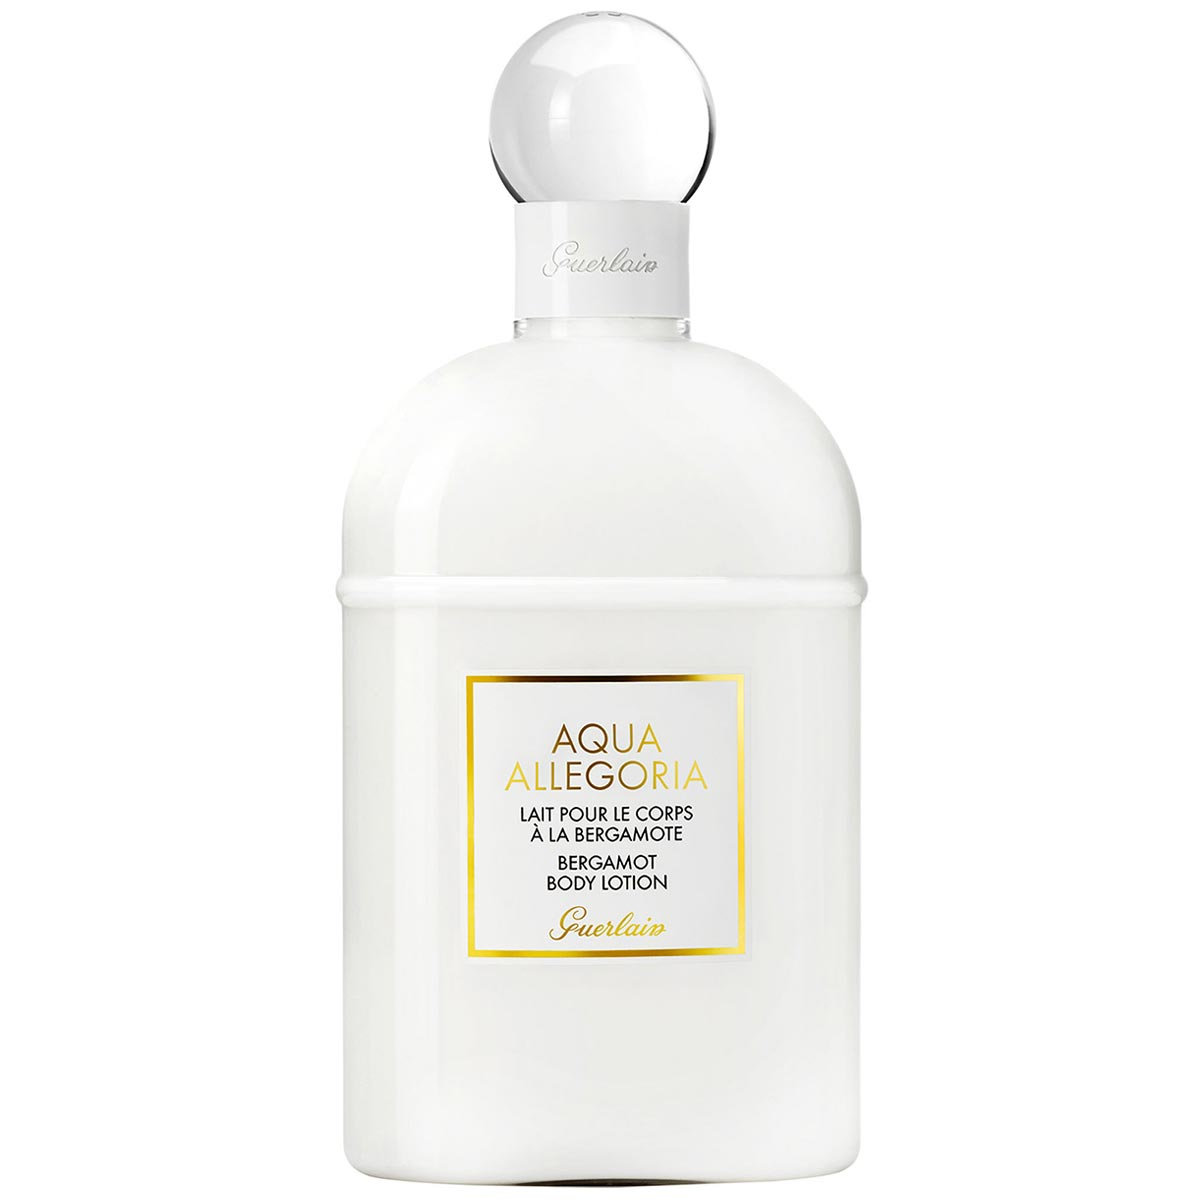 Guerlain - Guerlain - Aqua Allegoria - Lait Corps 200 ml